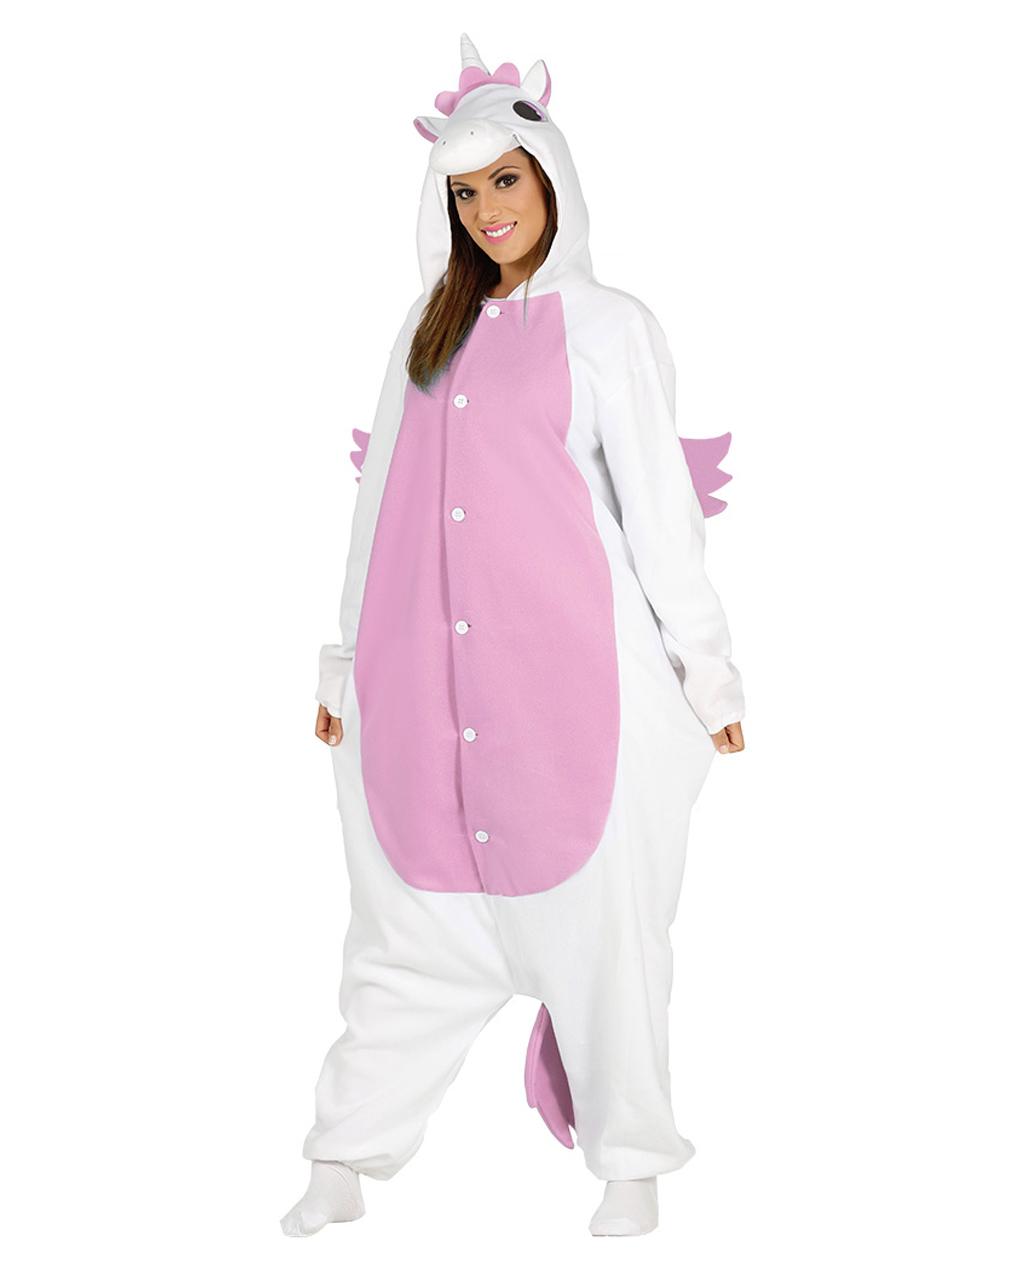 6b87027ed579 Unicorn Pajamas Costume as a jumpsuit